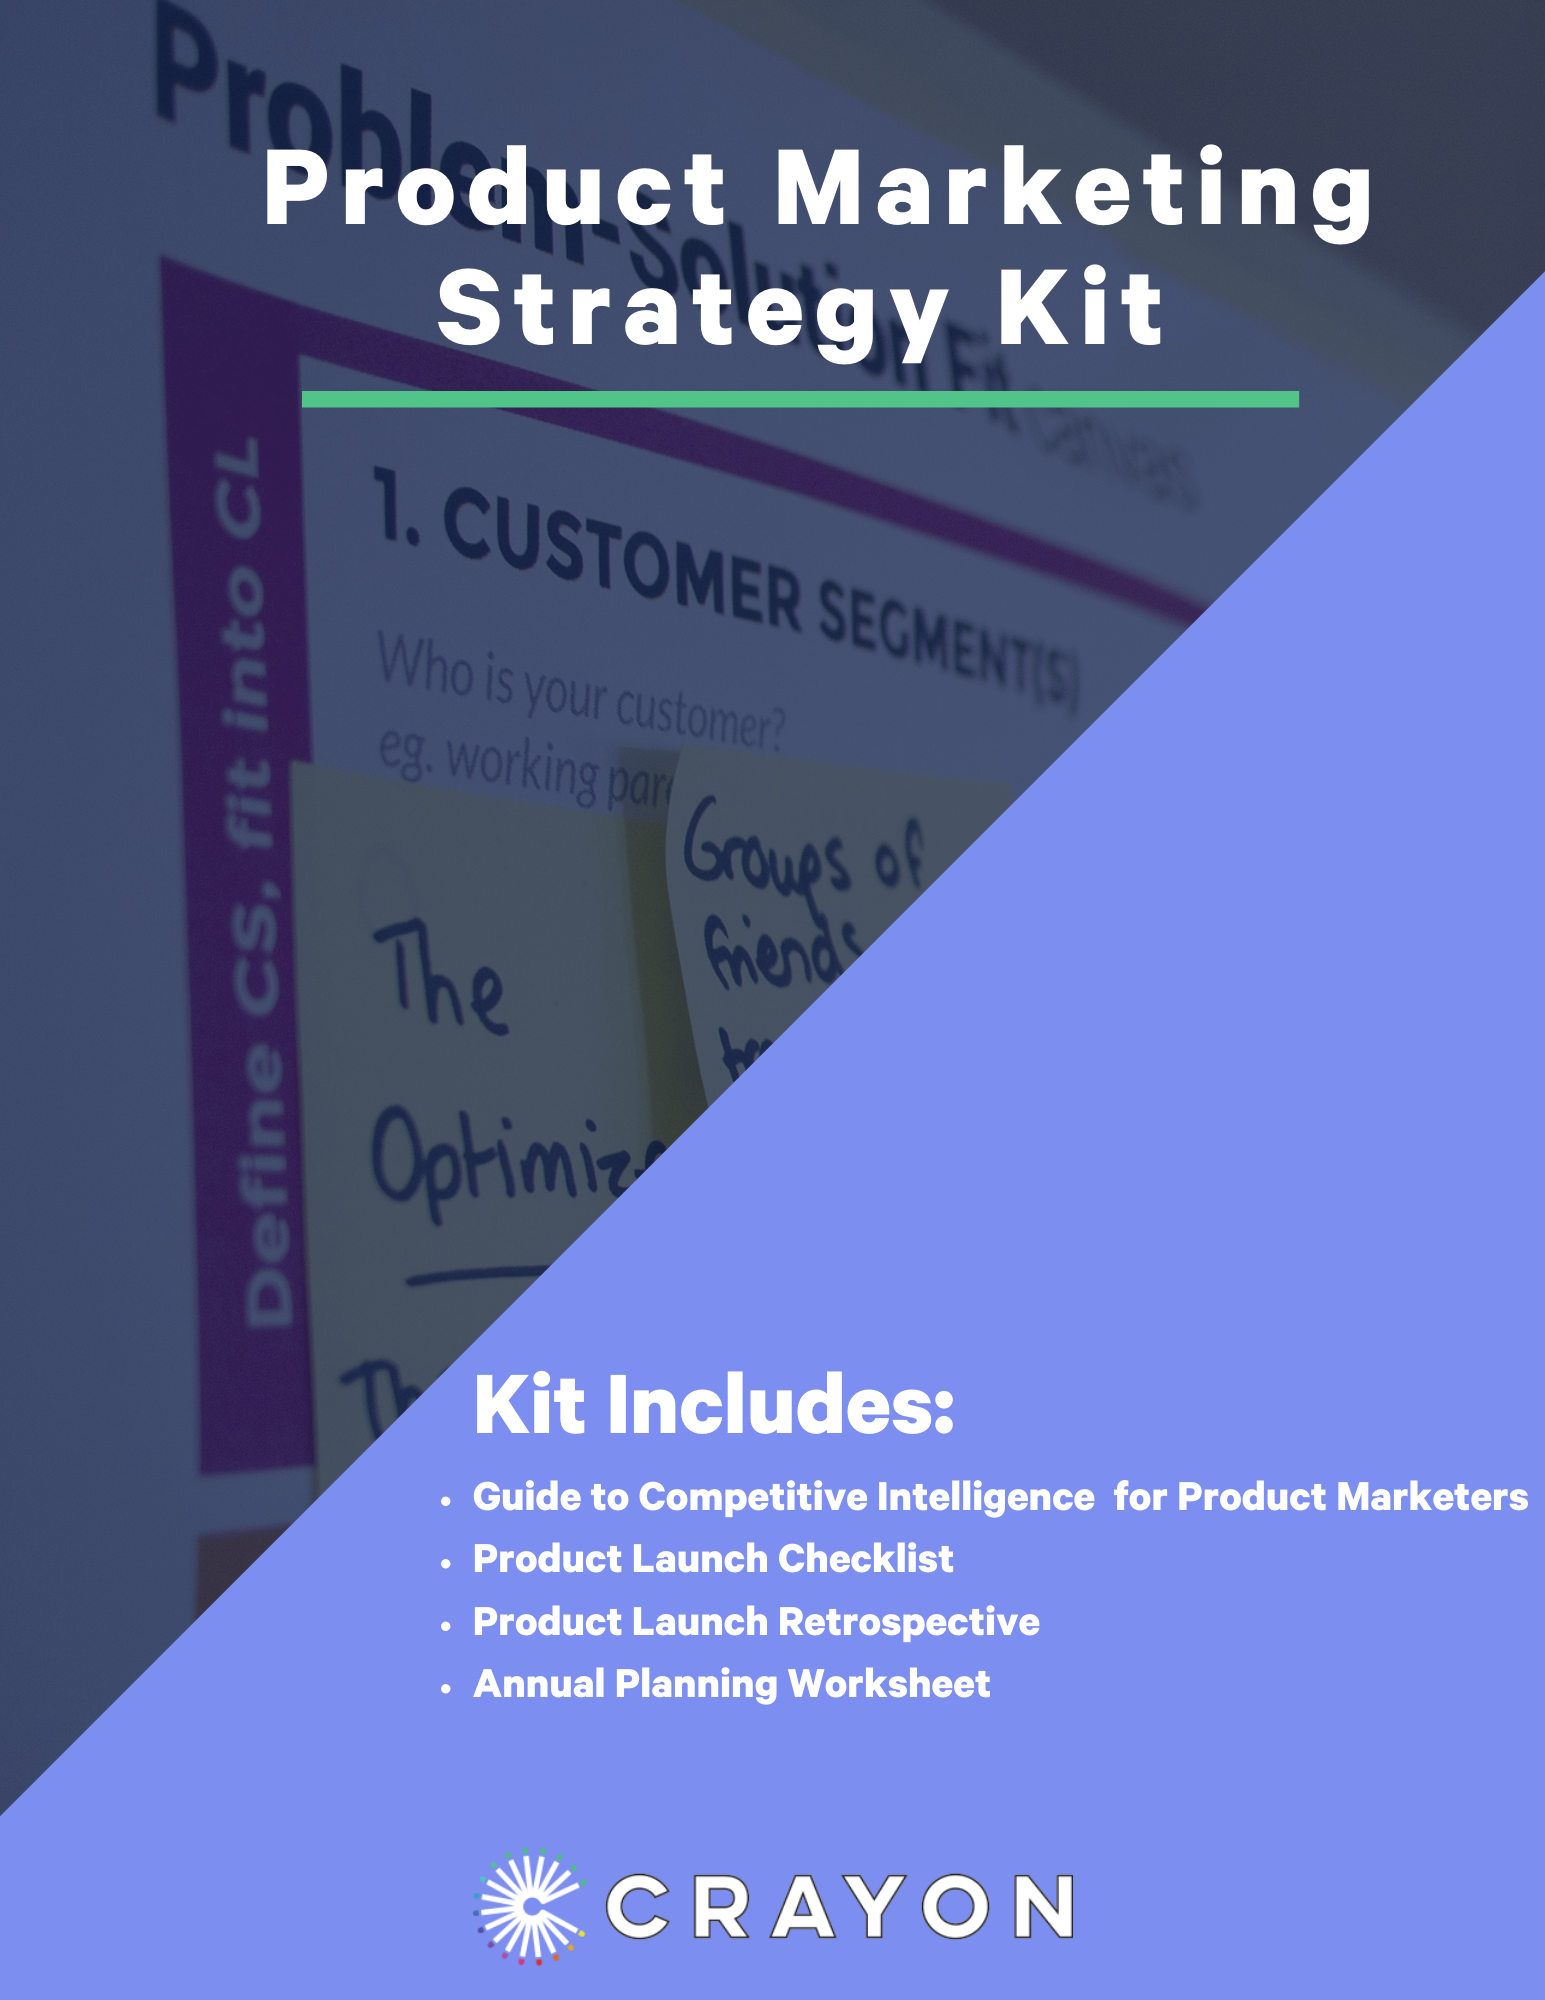 Product Marketing Strategy Kit